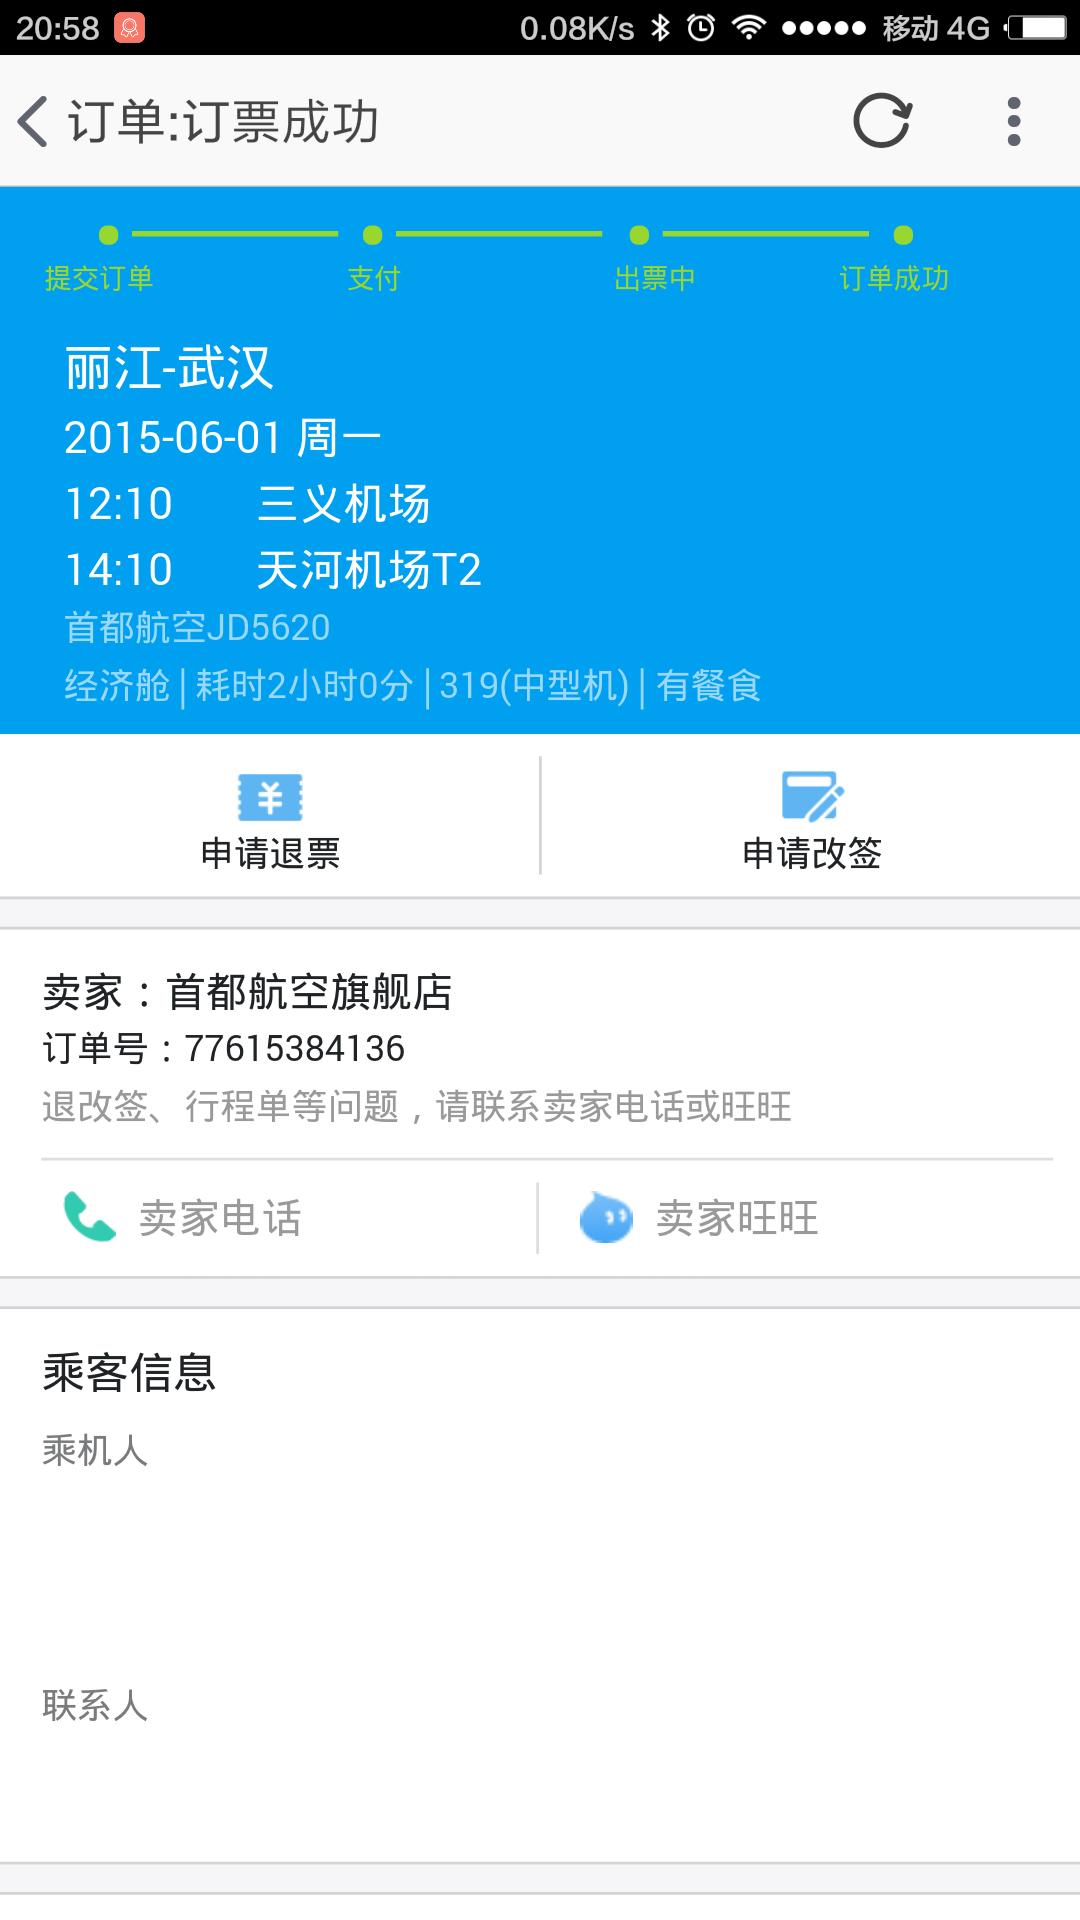 Screenshot_2015-11-09-20-58-21_com.taobao.taobao.png